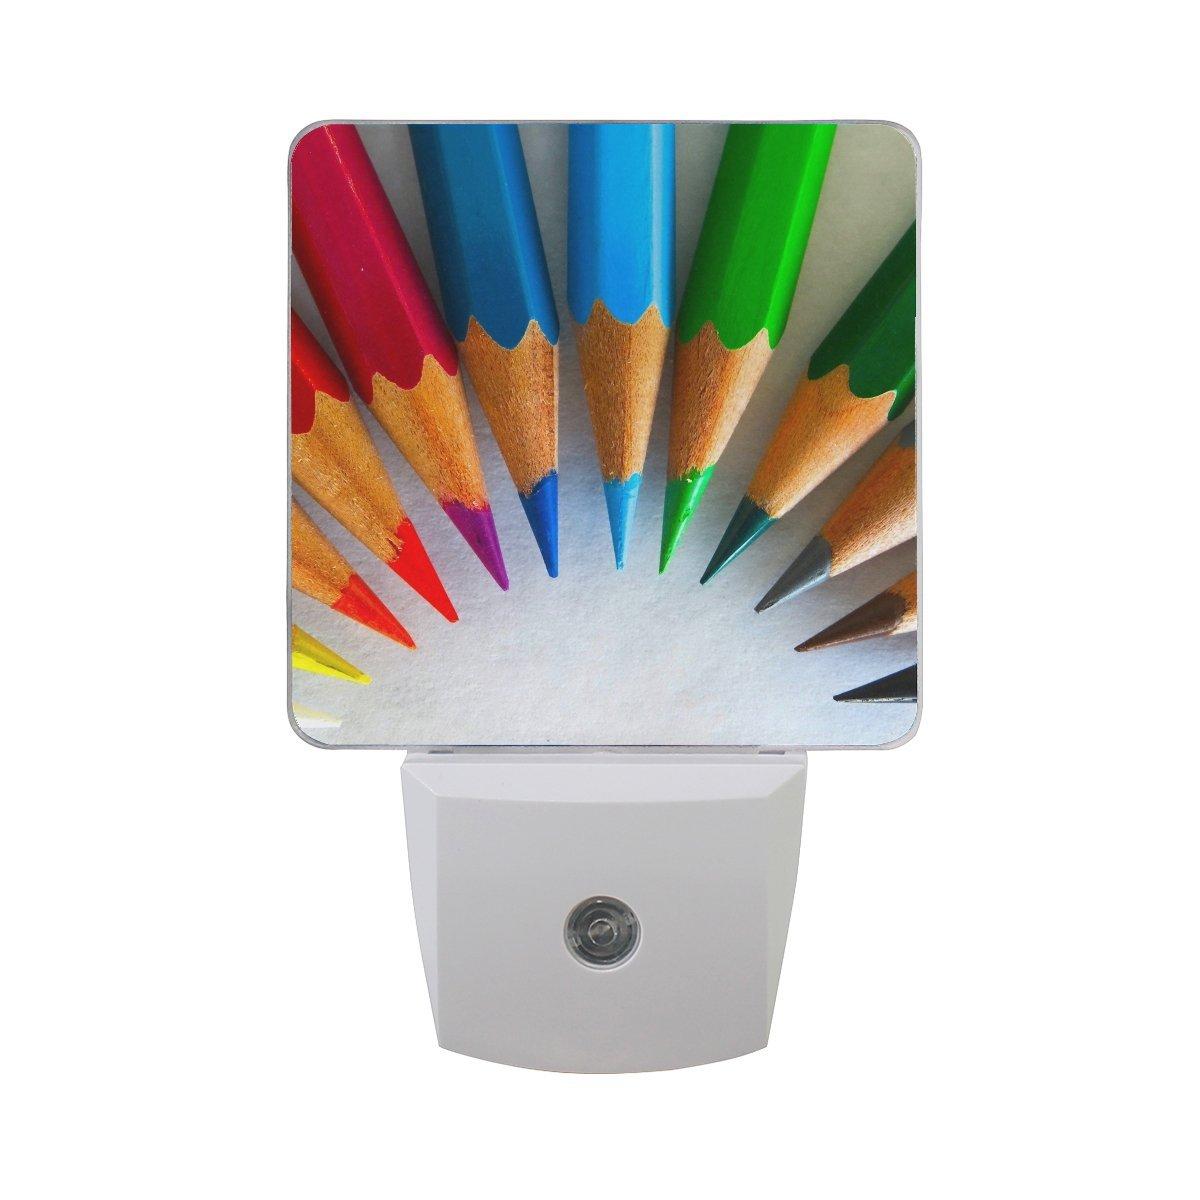 Colored Pencils SharpenedレインボーLED夜間ライトDusk to Dawnセンサープラグin Night Home Decorデスクランプfor Adult B07BQQRR6V 14960